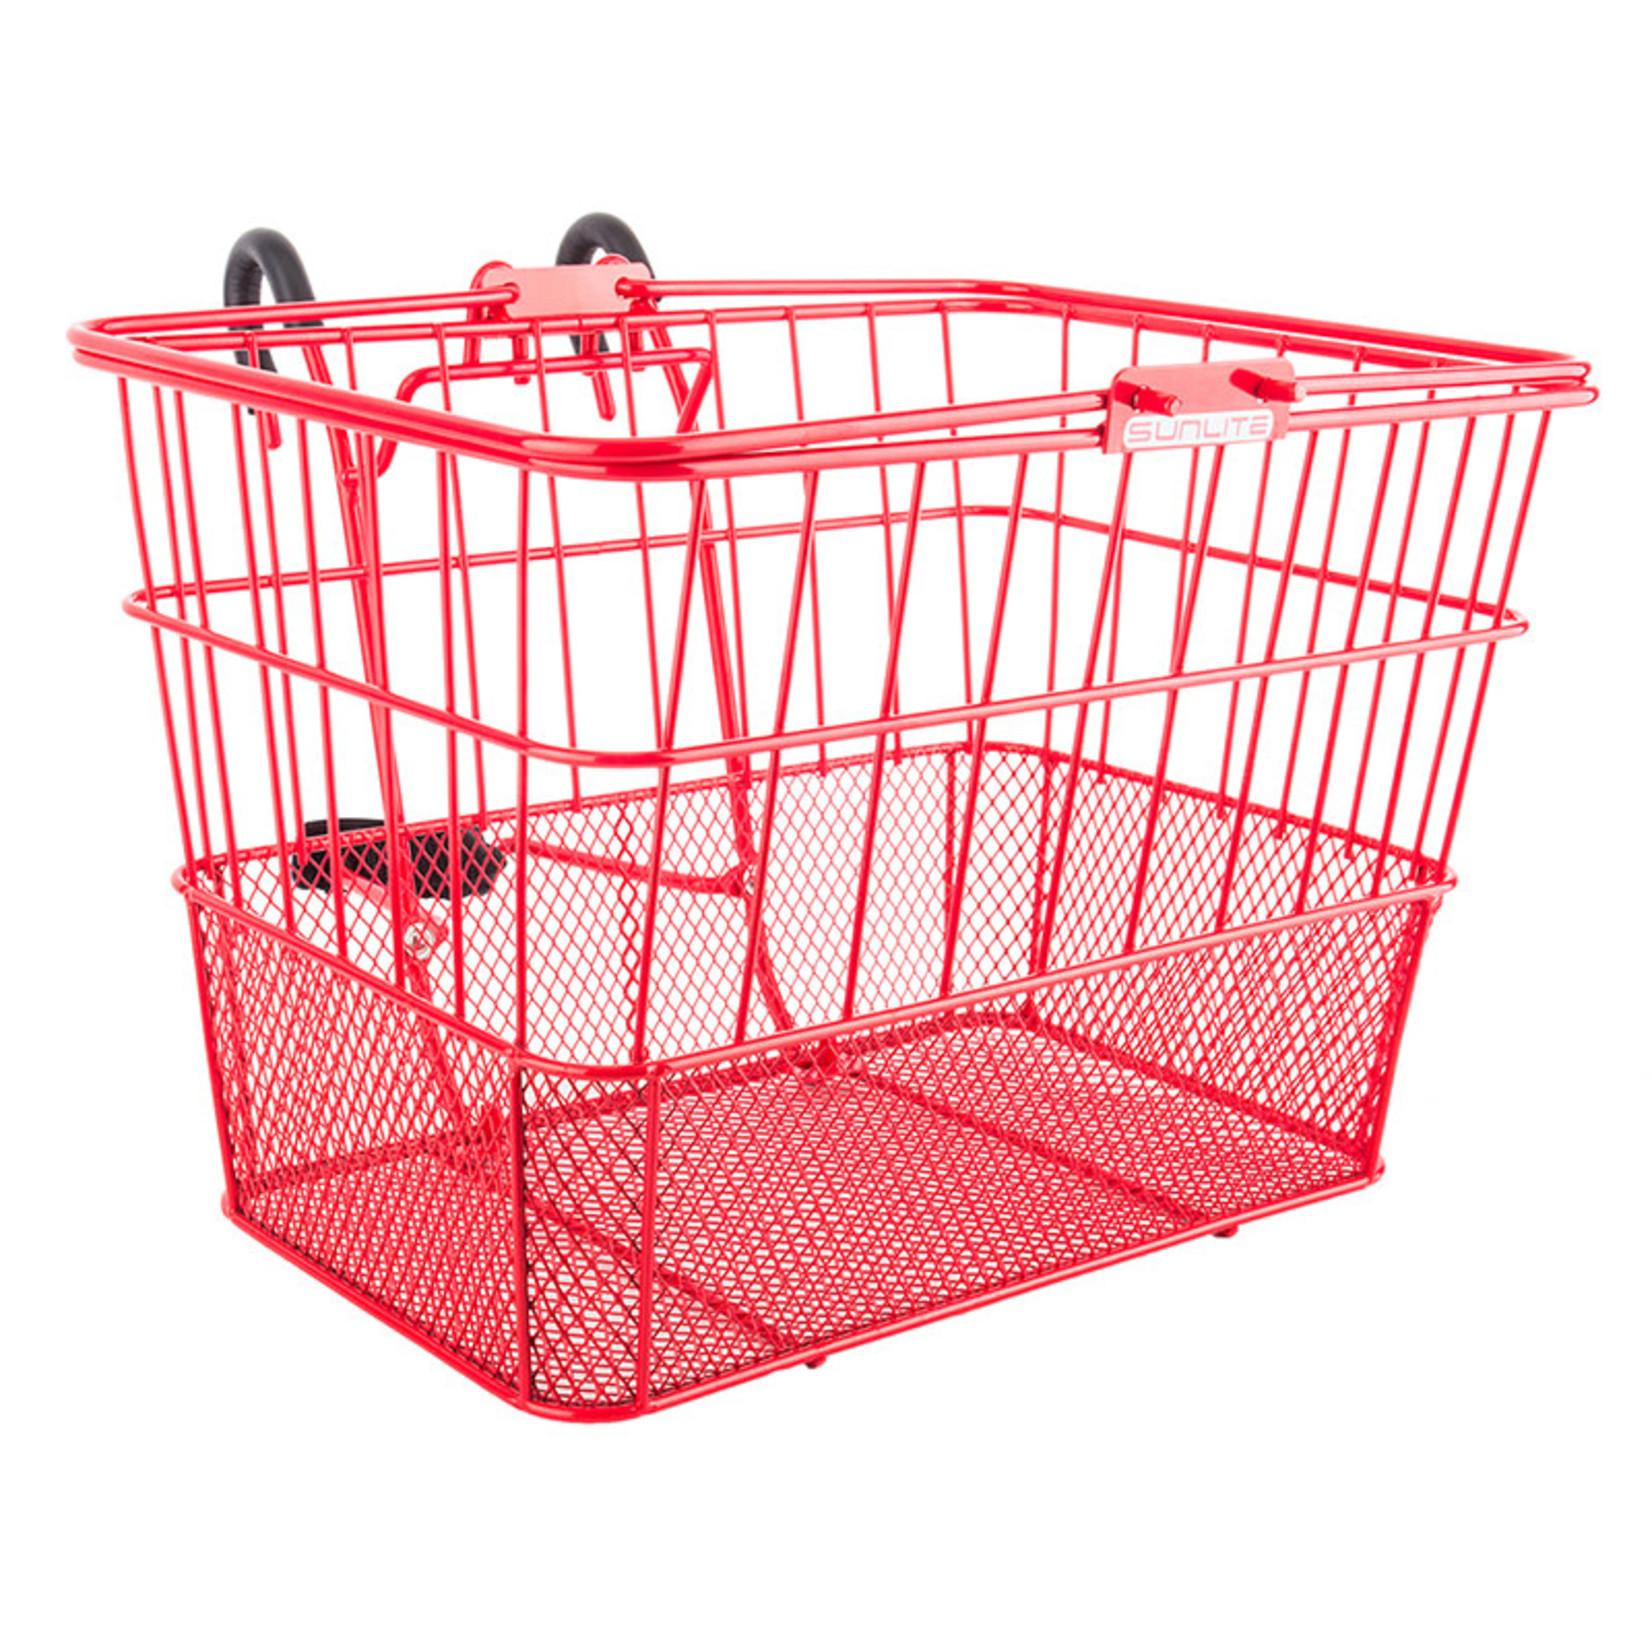 Standard Mesh Bottom Lift-Off Red